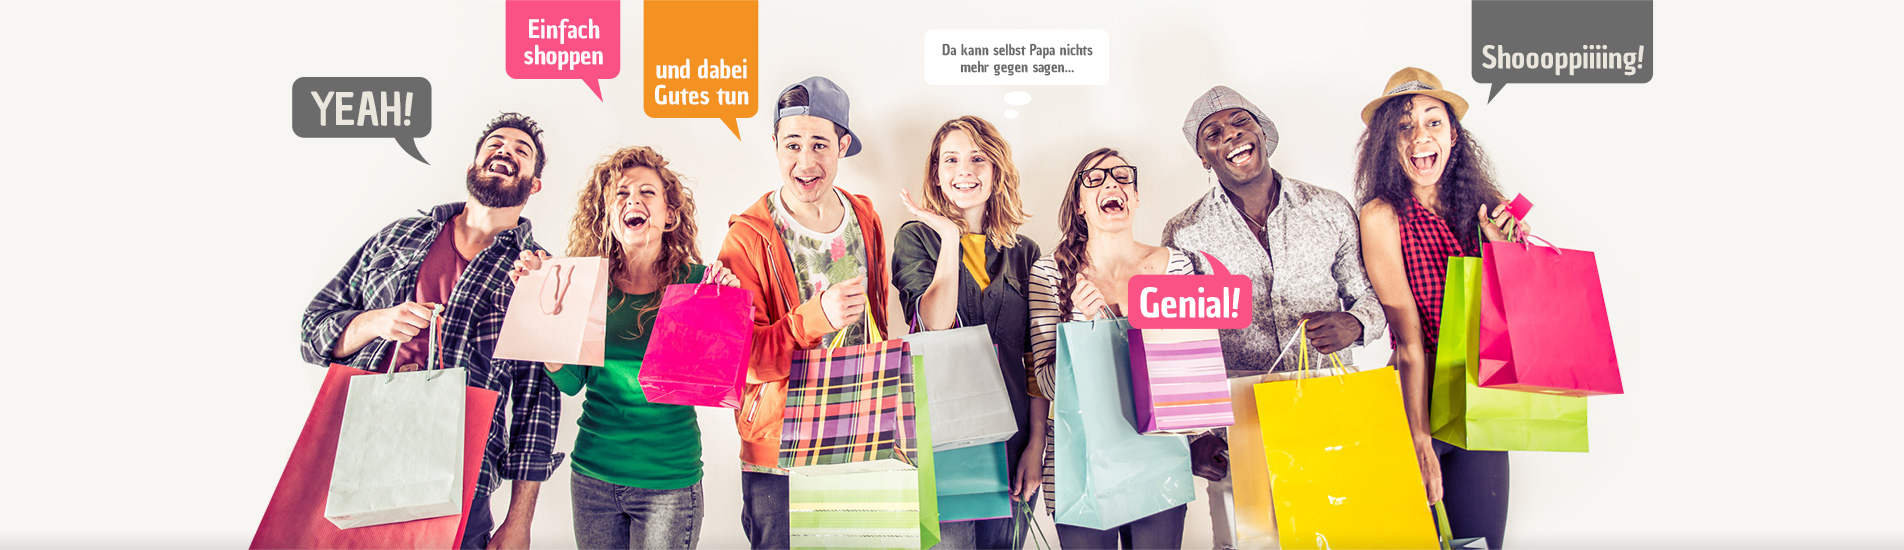 shopping4help